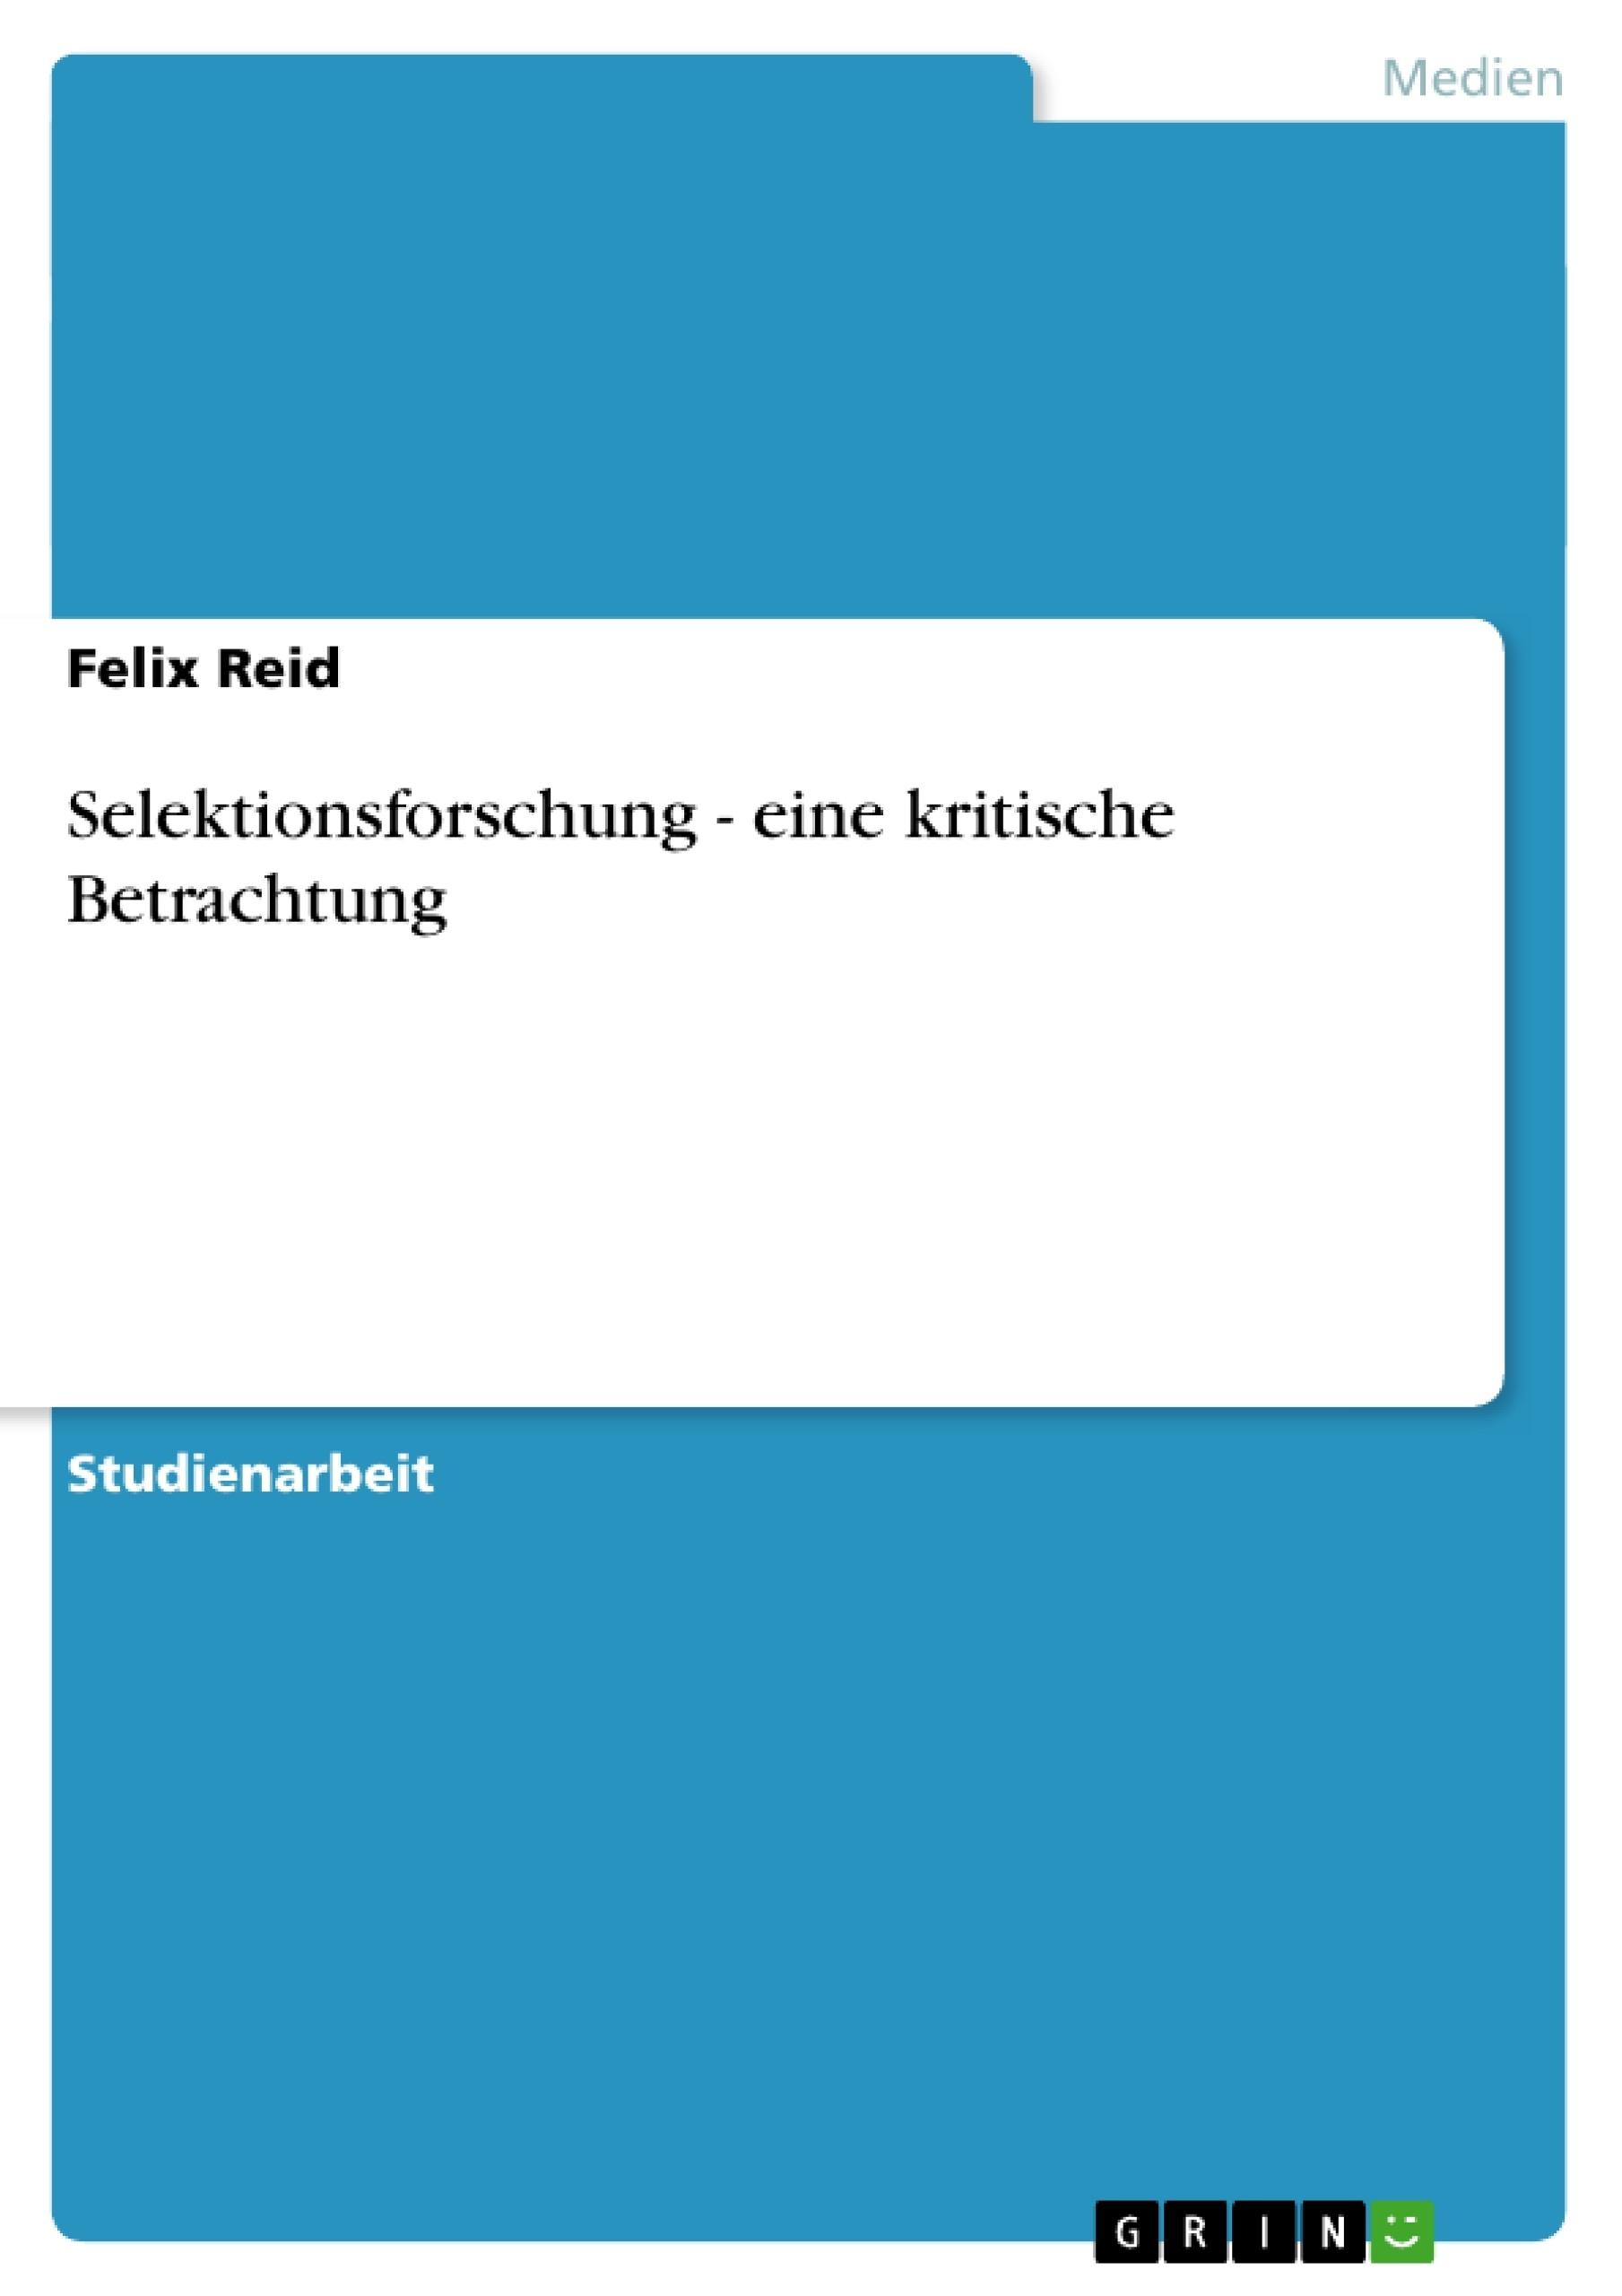 Titel: Selektionsforschung - eine kritische Betrachtung